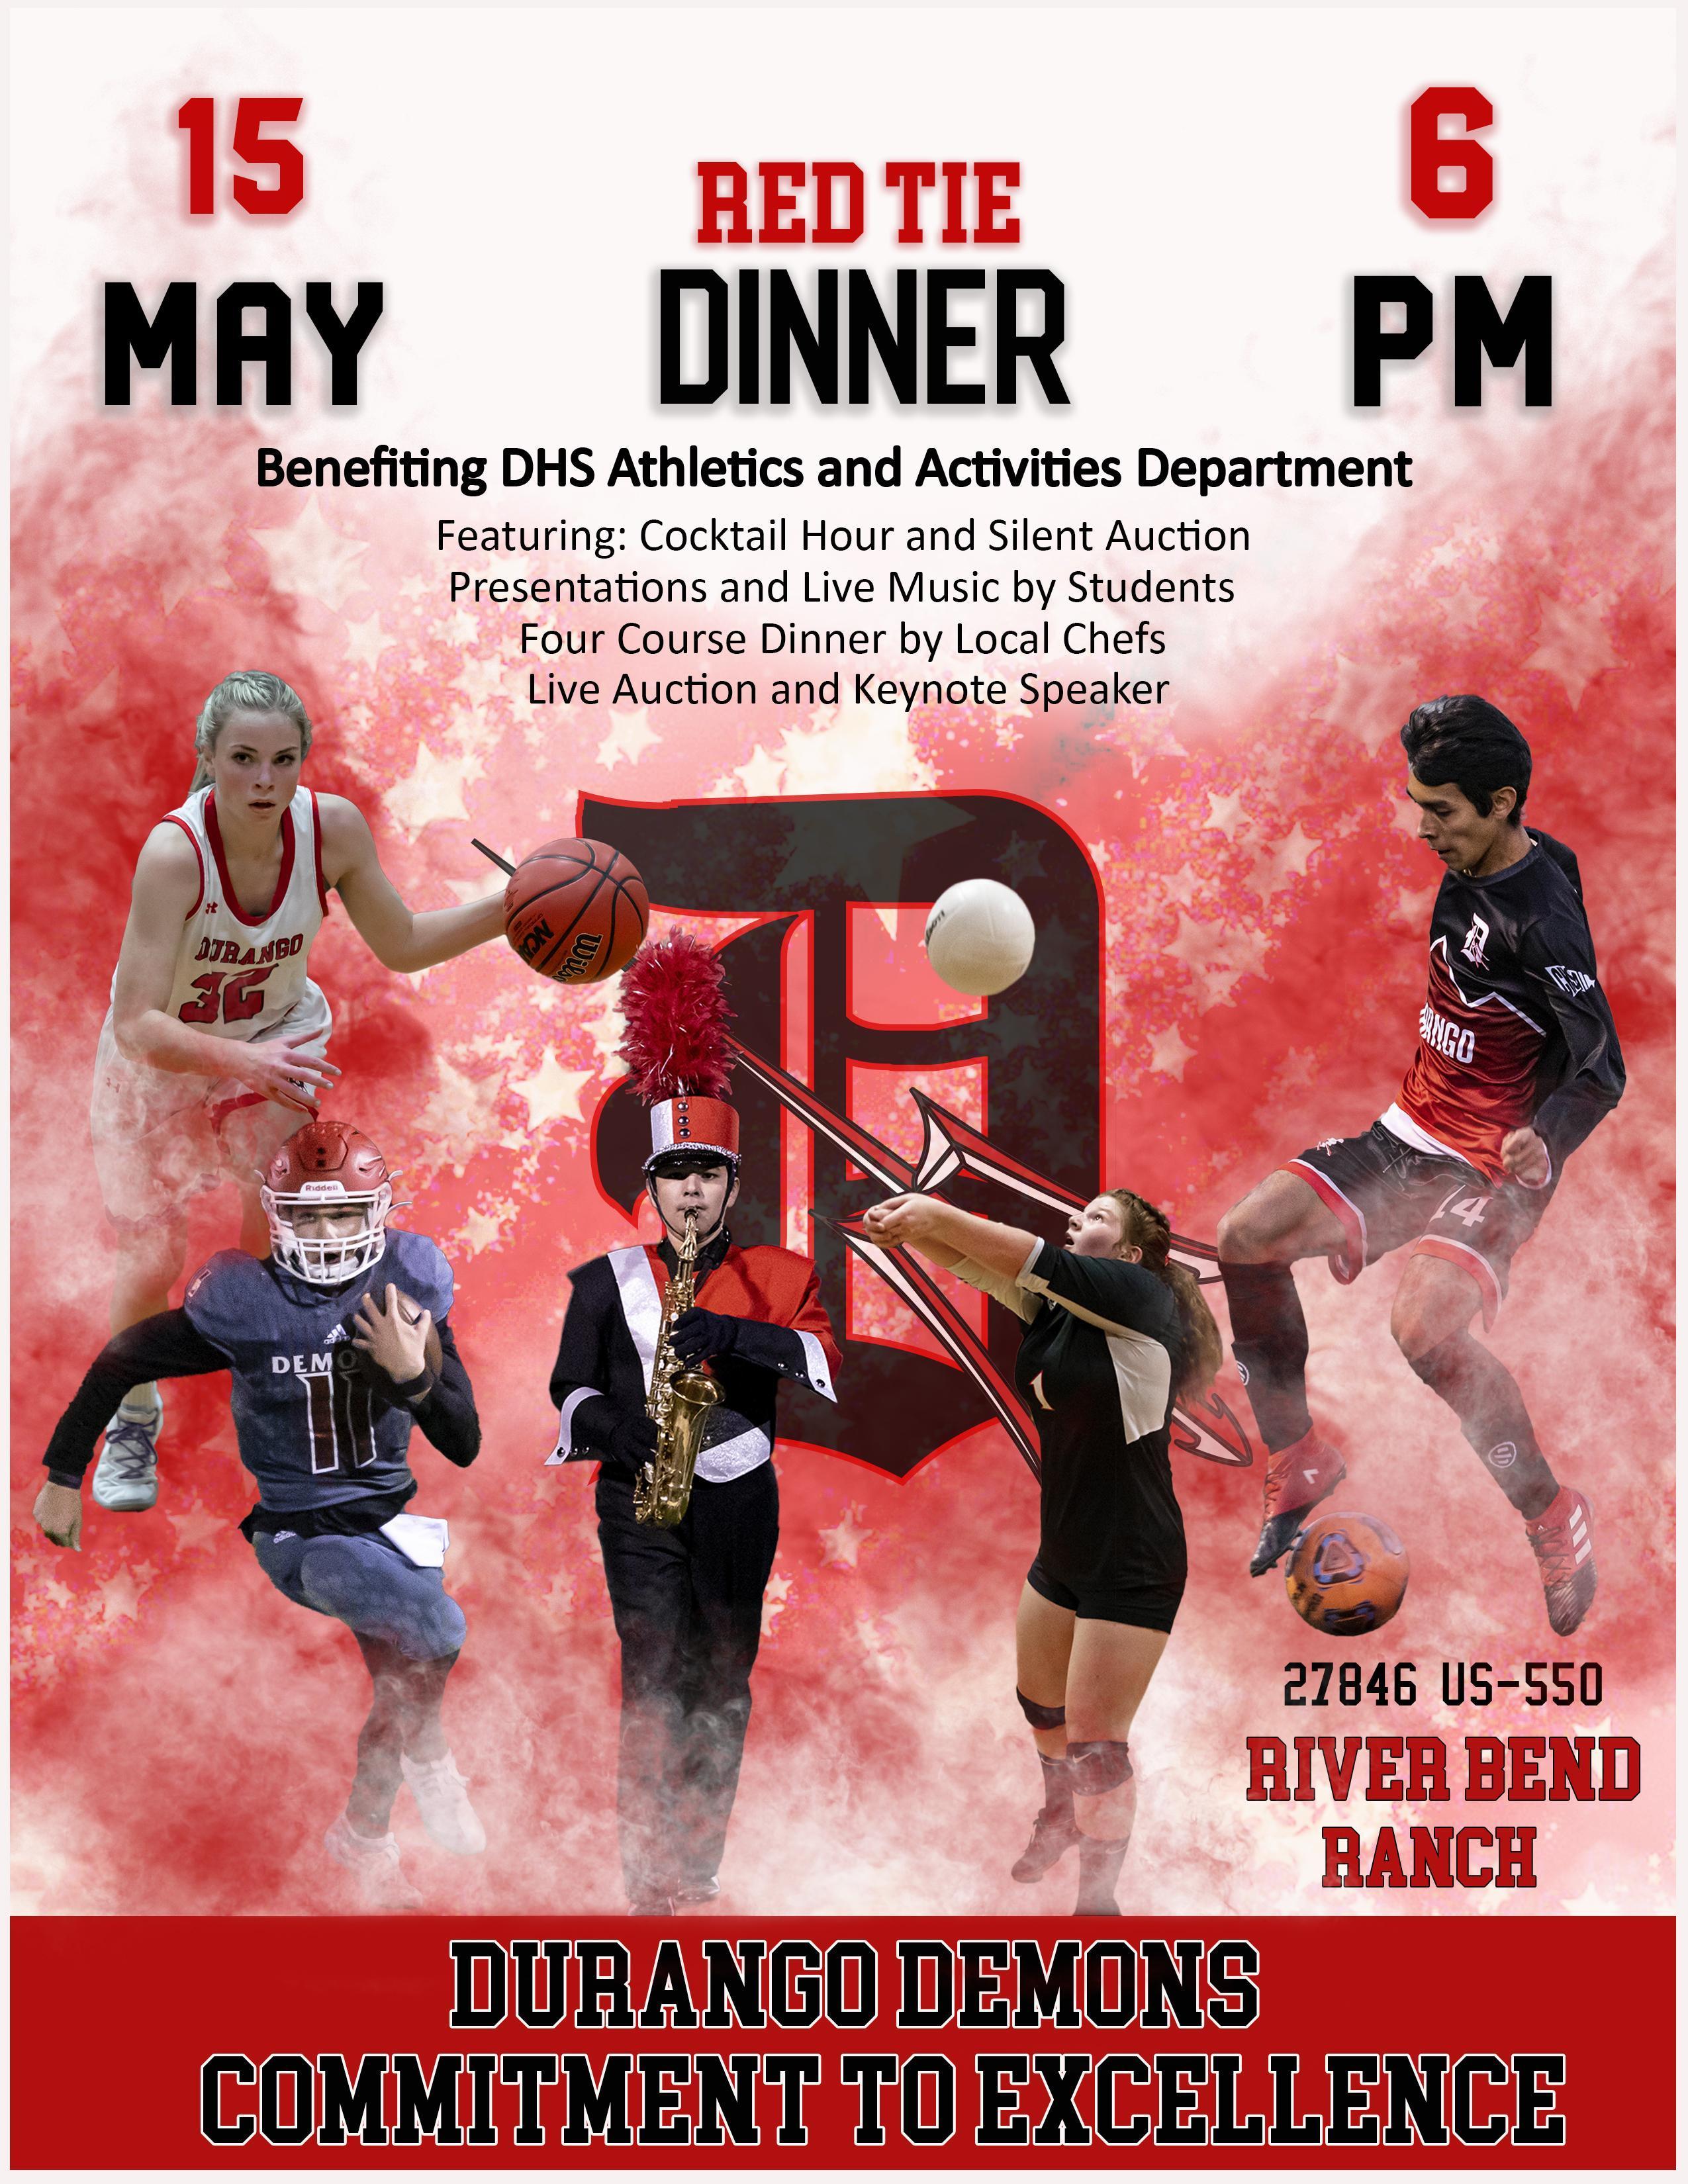 Red Tie Dinner